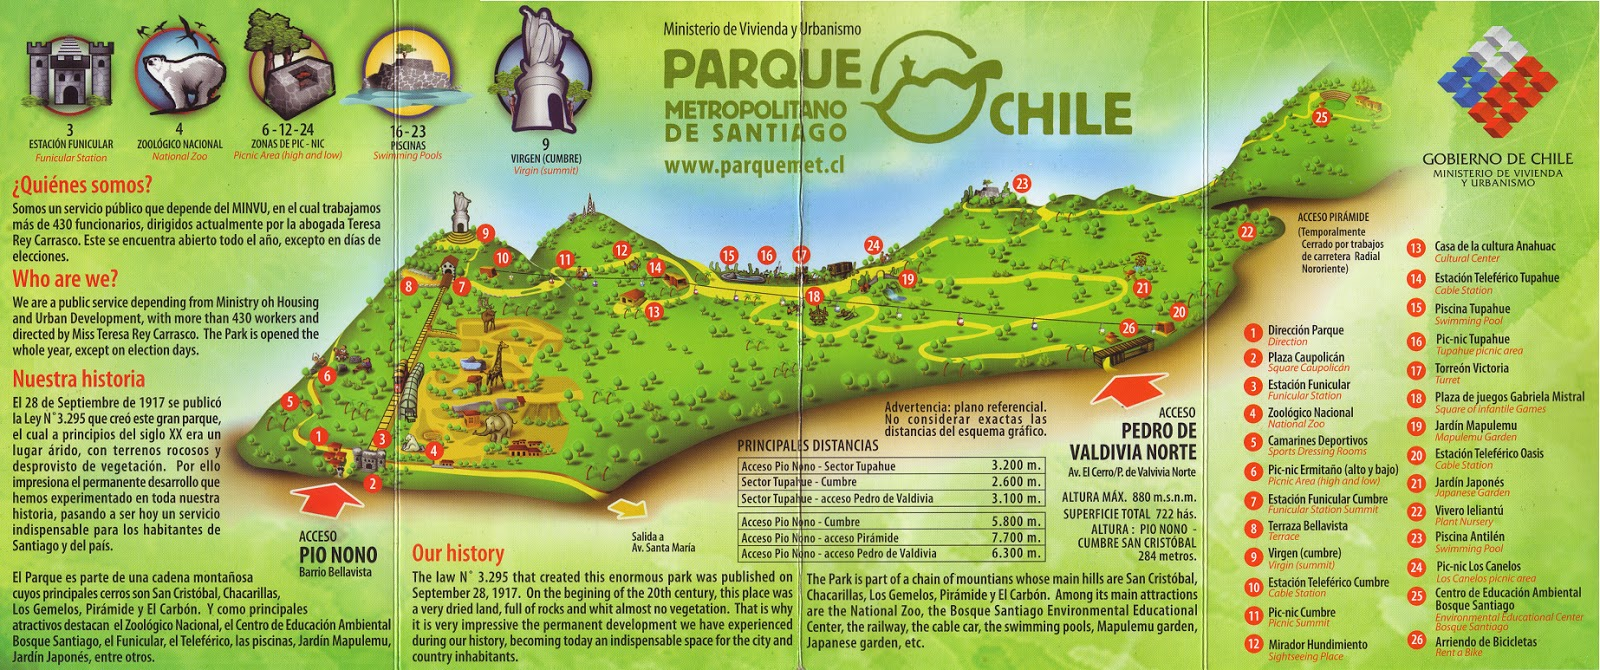 Viagens de carolina martinez cerro san crist bal parque for Jardin japones de santiago